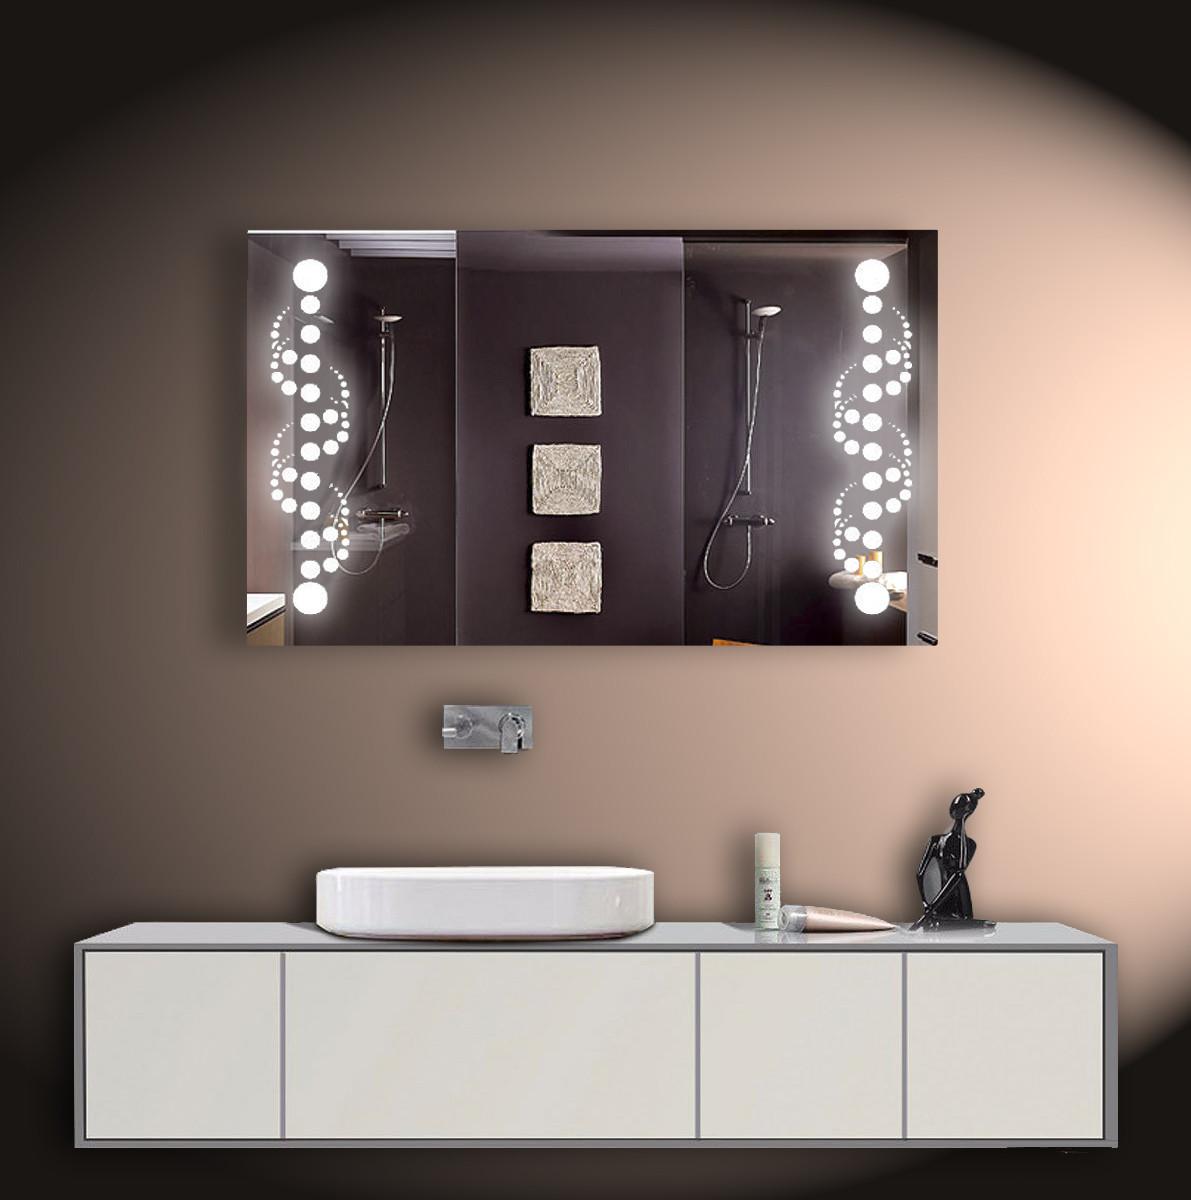 Зеркало LED со светодиодной подсветкой ver-3083 1000х600 мм